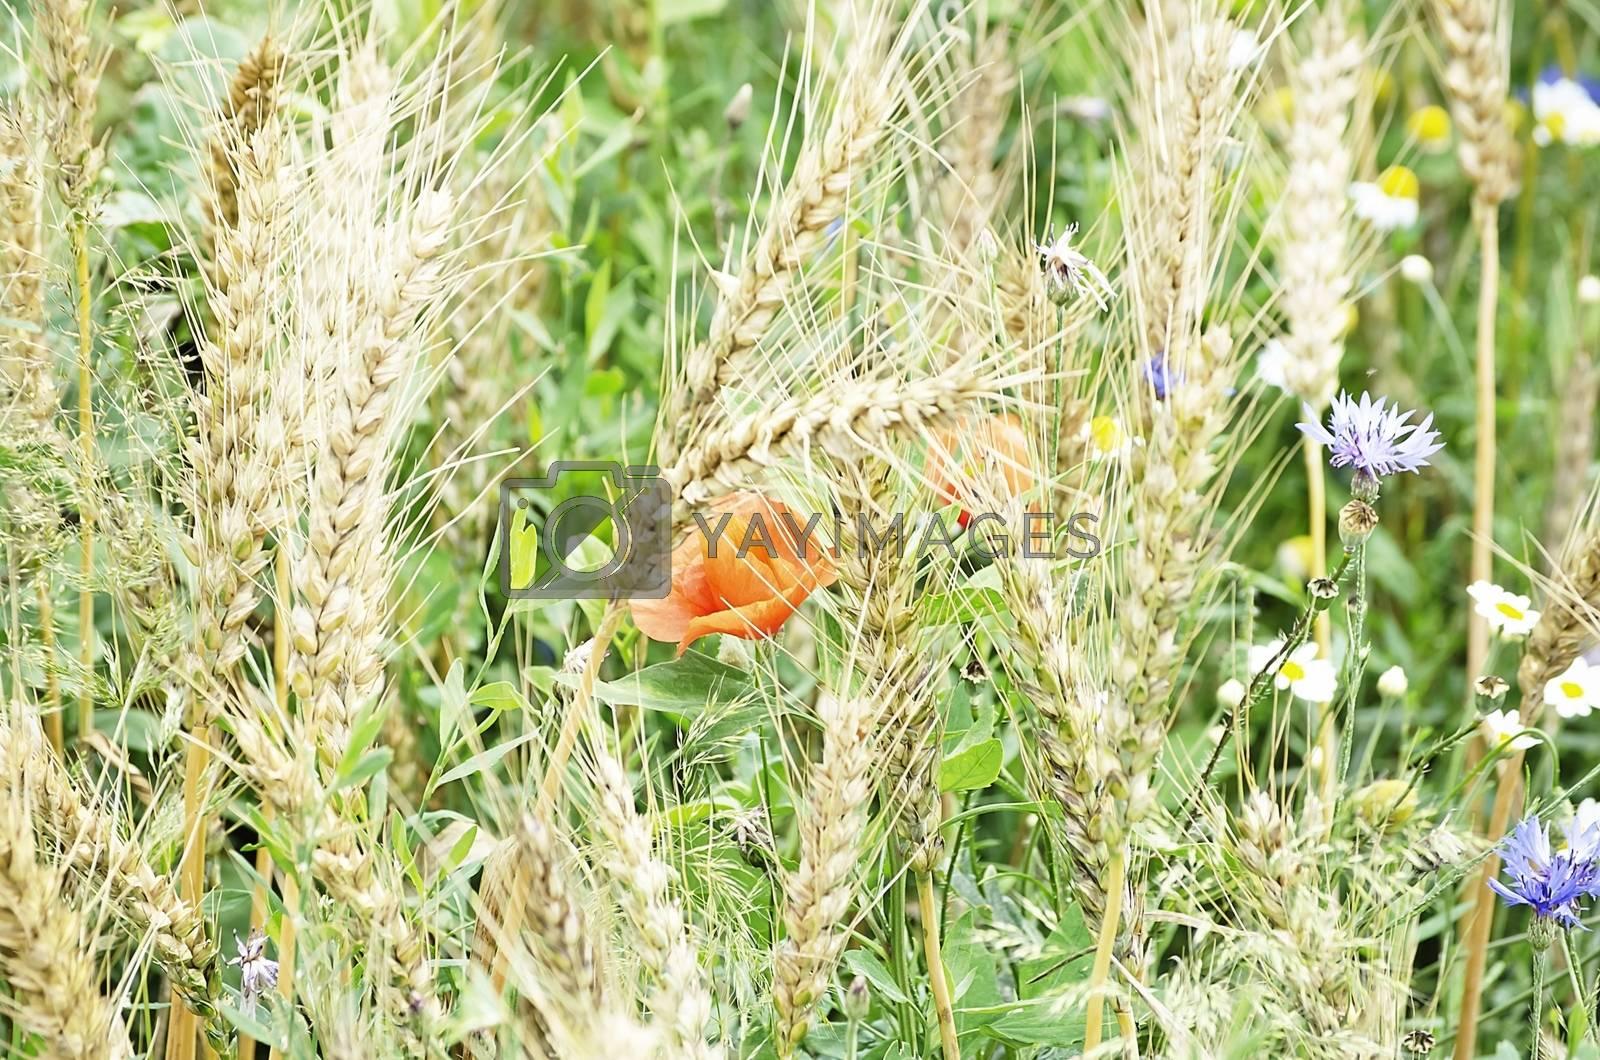 Wheat Field With CornFlower and Poppy Flower